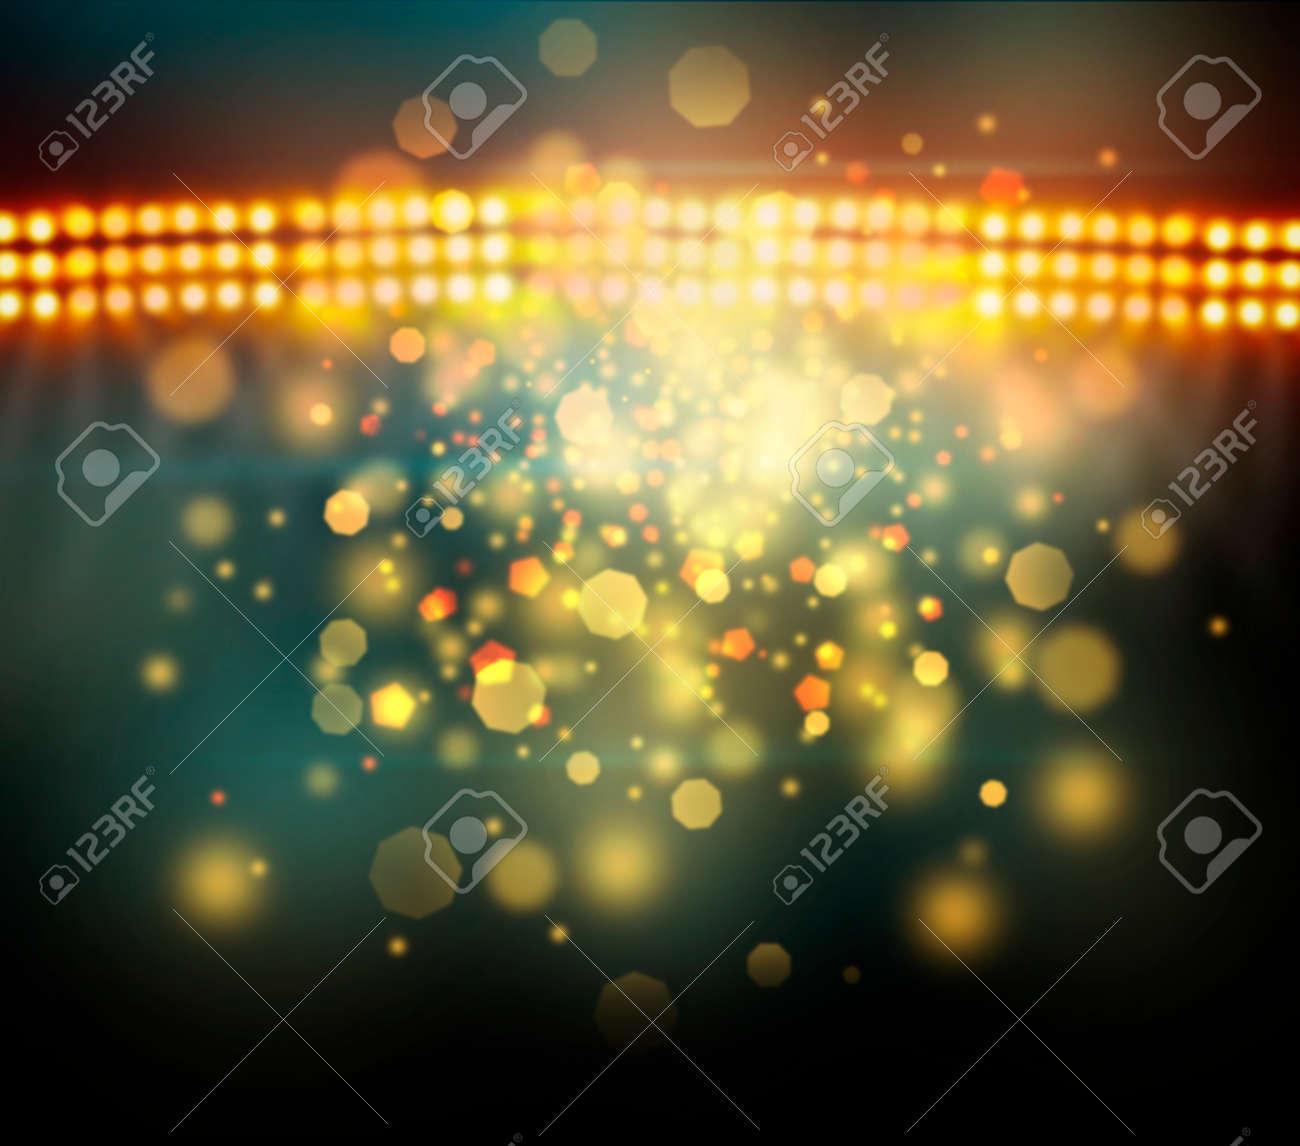 Image of defocused stadium lights at night - 29776677